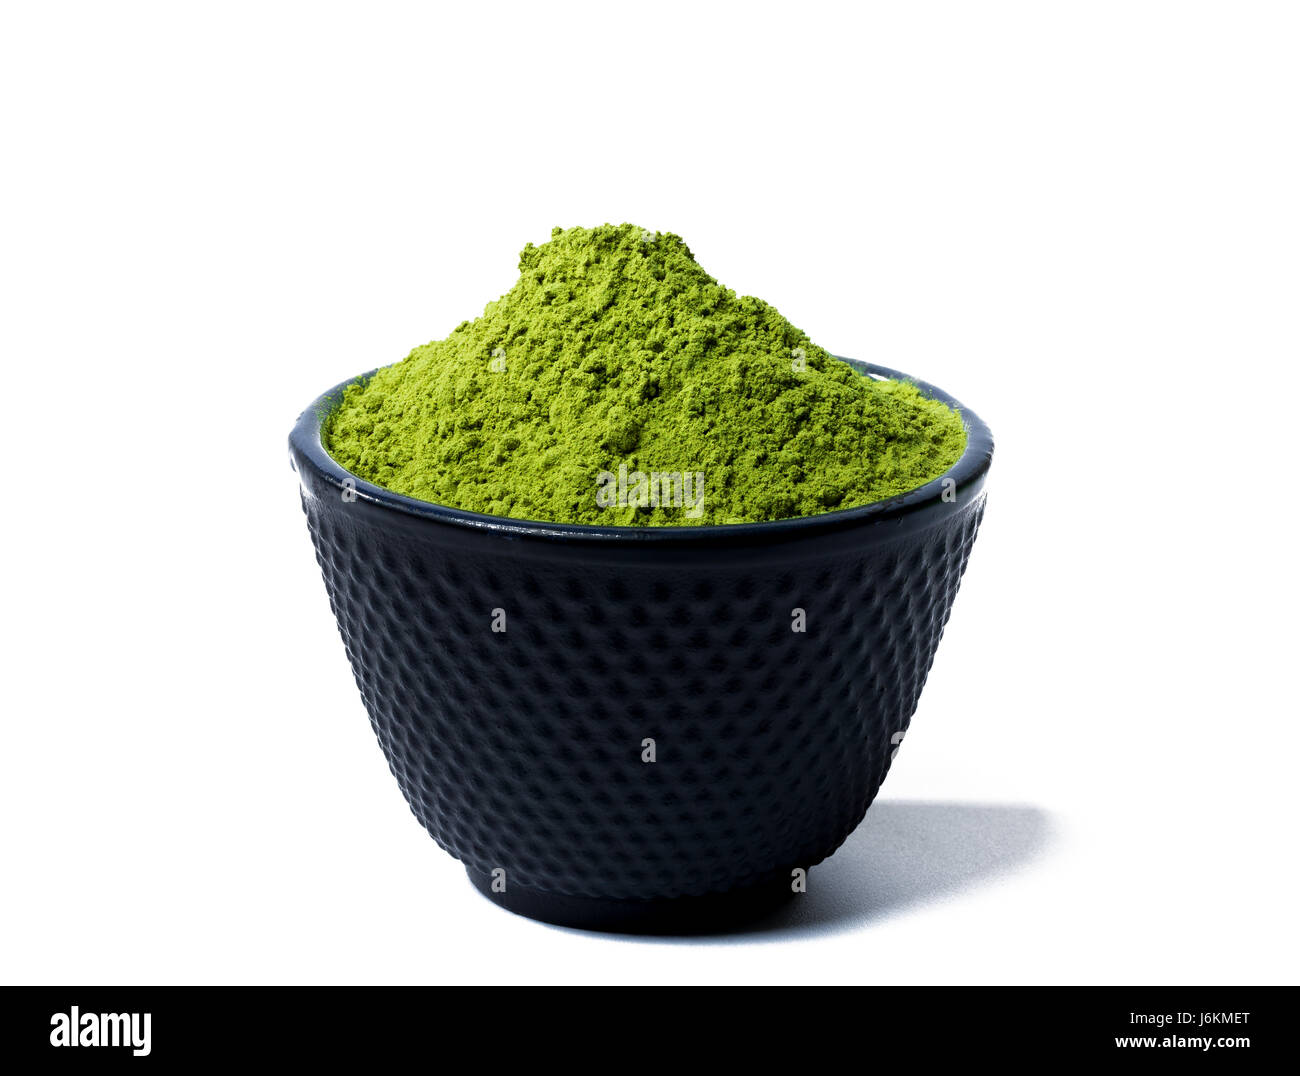 green matcha tea powder in black bowl isolated on white background Stock Photo